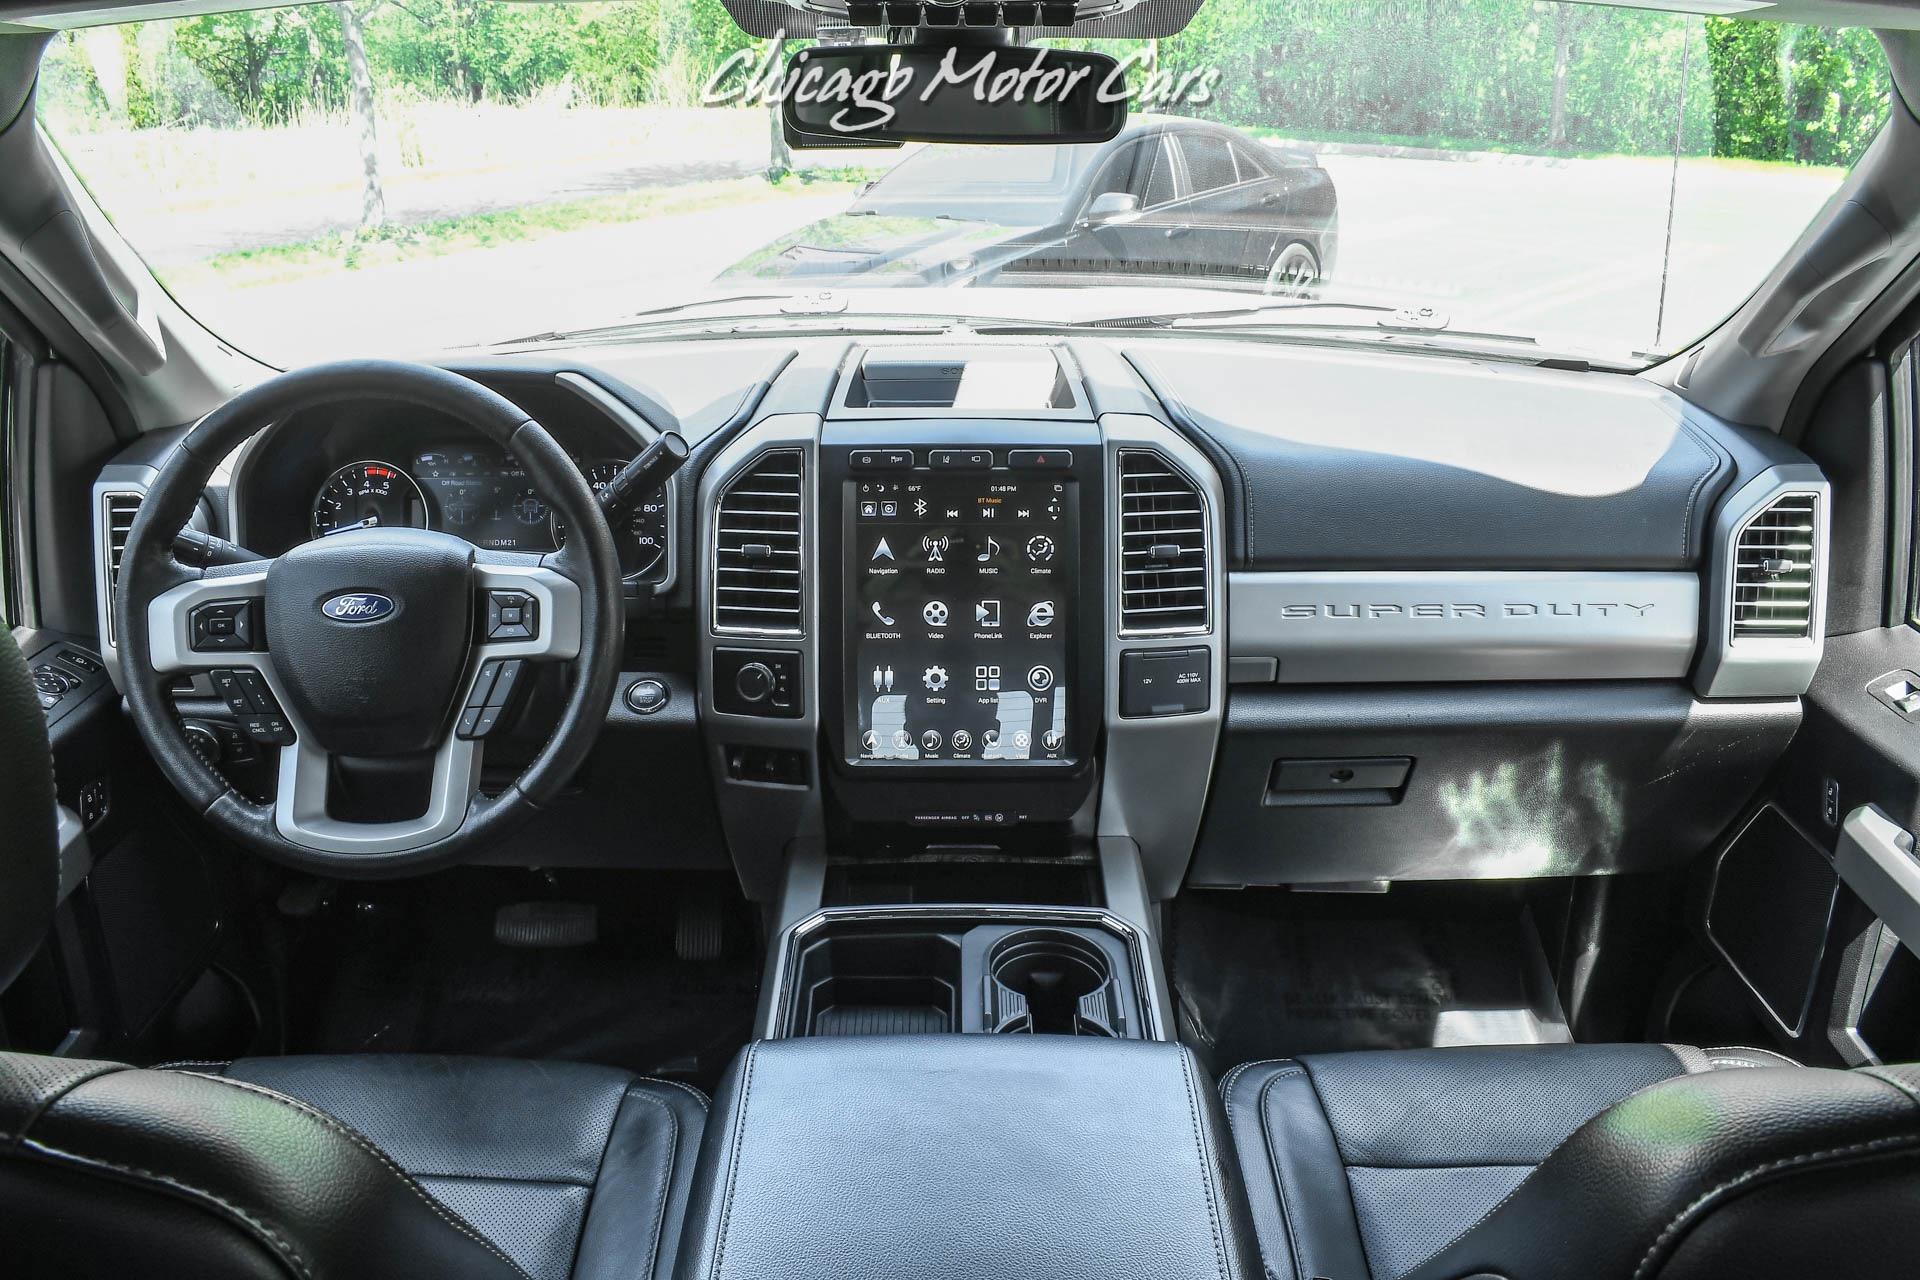 Used-2017-Ford-F-350-Super-Duty-Lariat-Crew-Cab-4x4-67L-Powerstroke-Diesel--Upgrades